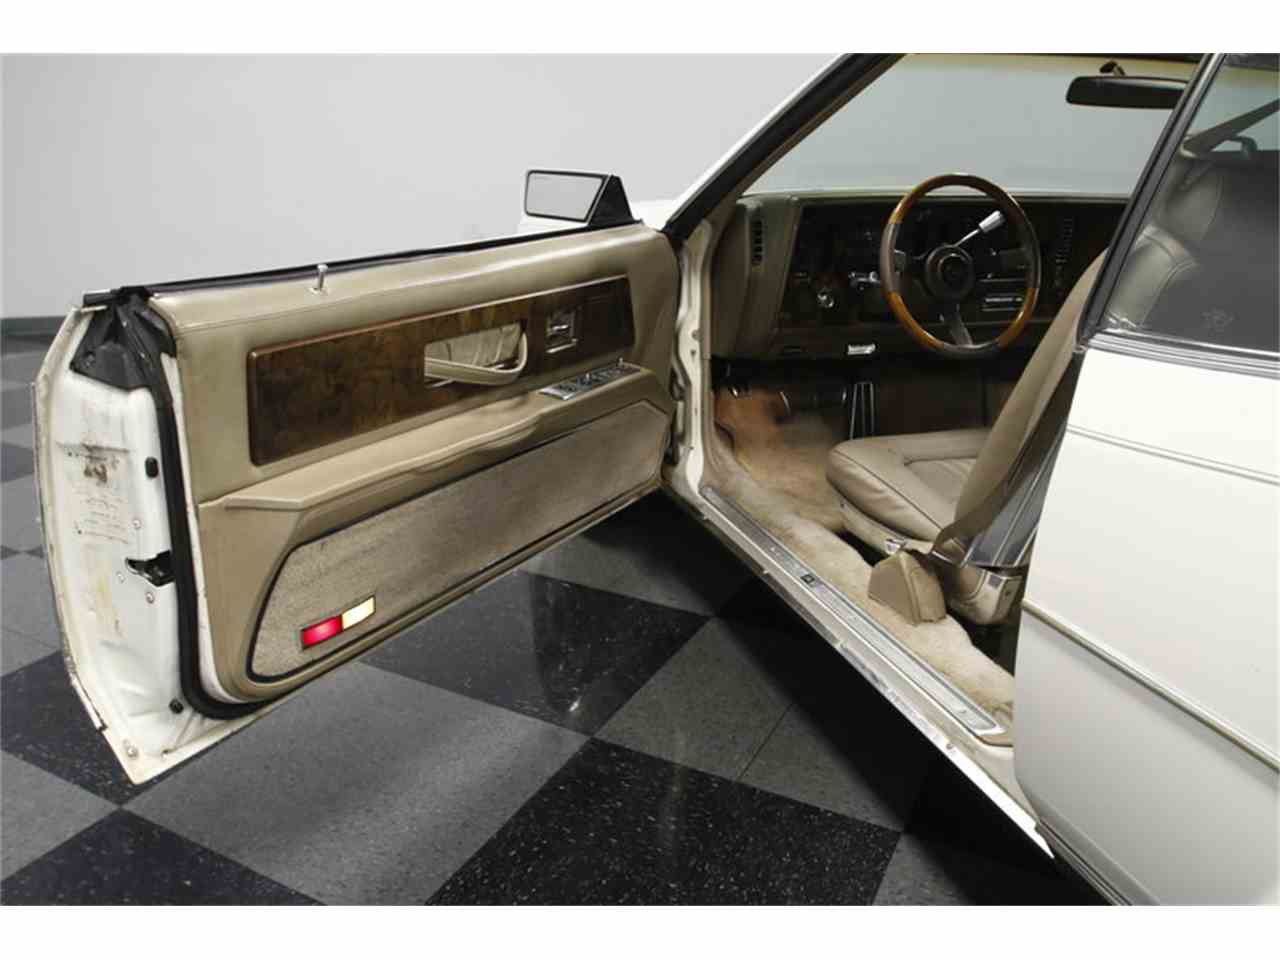 Large Picture of '85 Riviera located in Concord North Carolina - $8,995.00 - MEQO